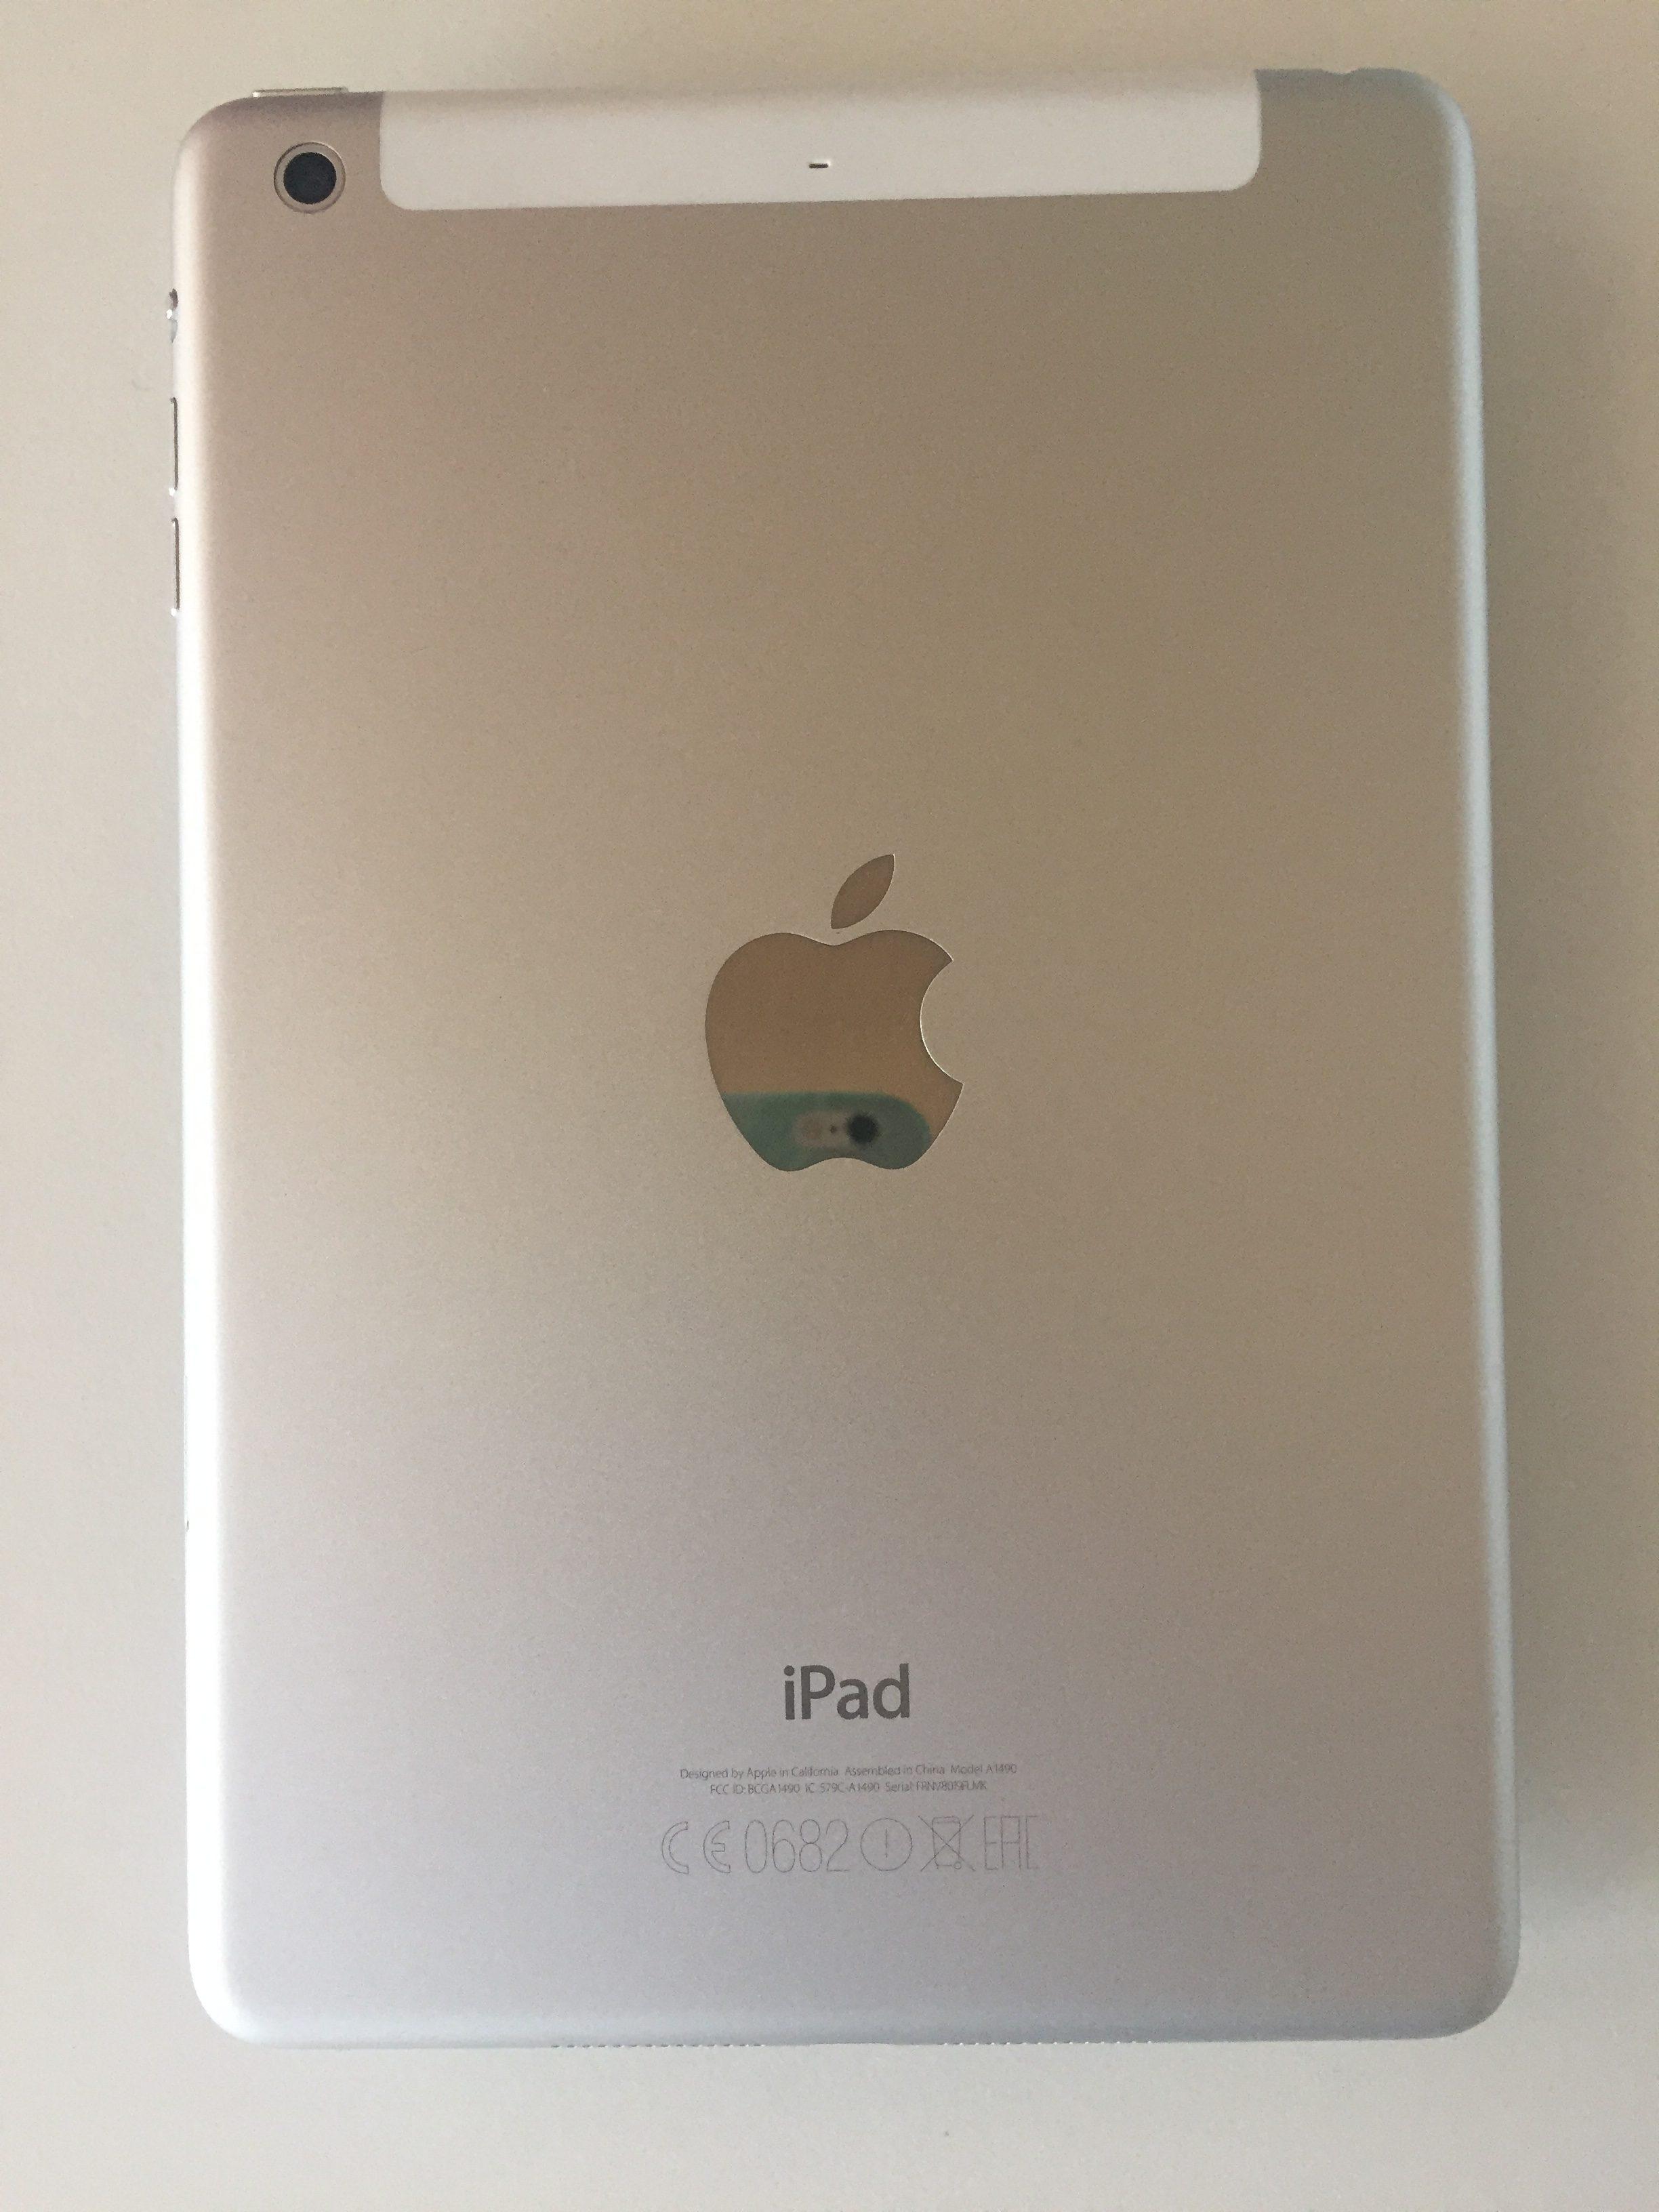 iPad mini 2 Wi-Fi + Cellular 16GB, 16 GB, Silver, imagen 2